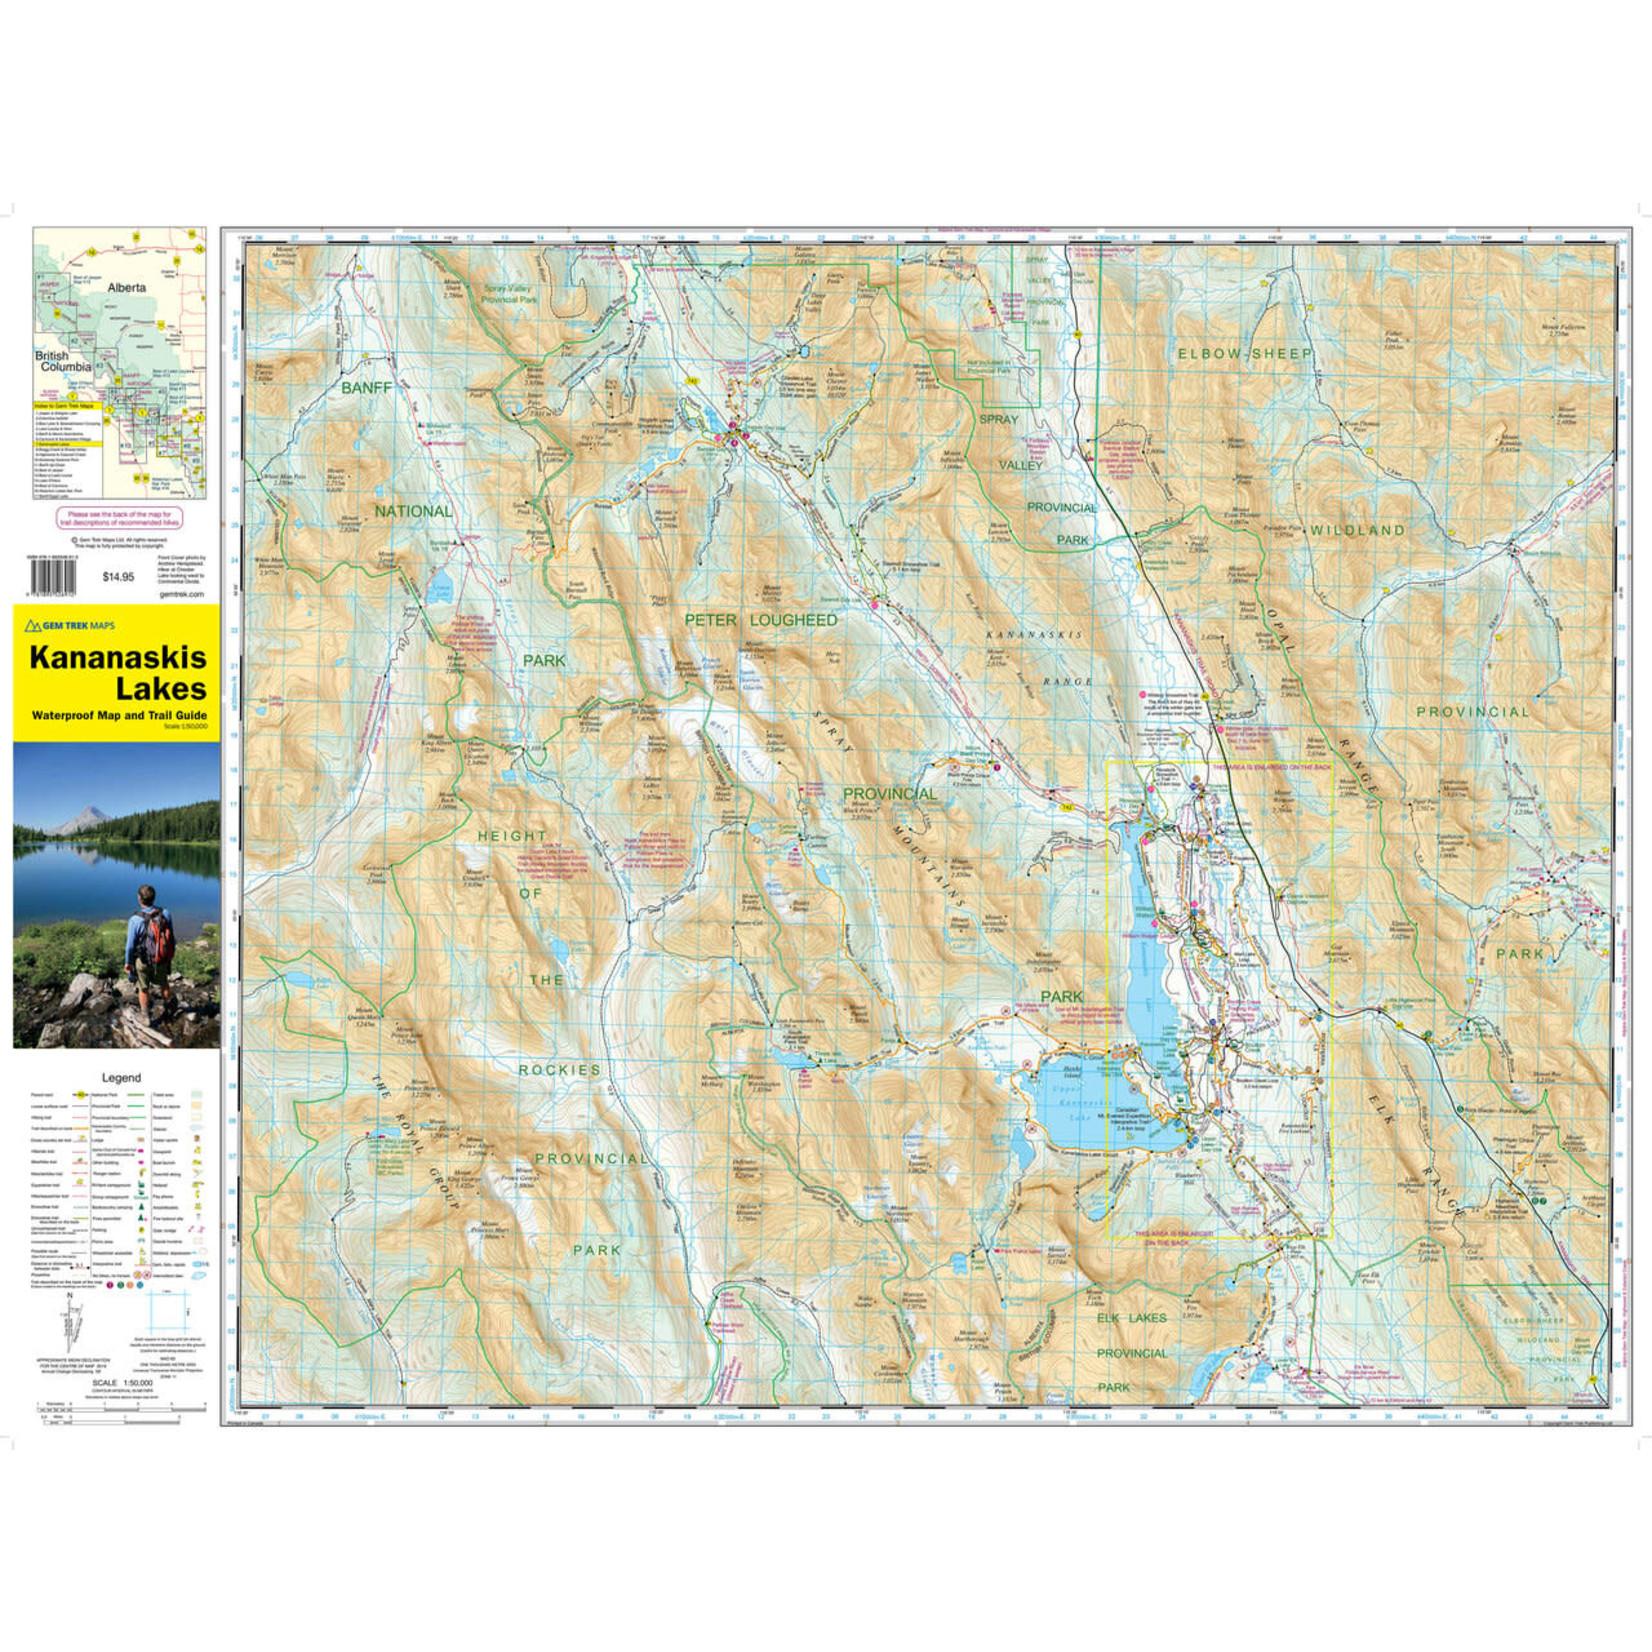 Gemtrek map Kananaskis Lakes